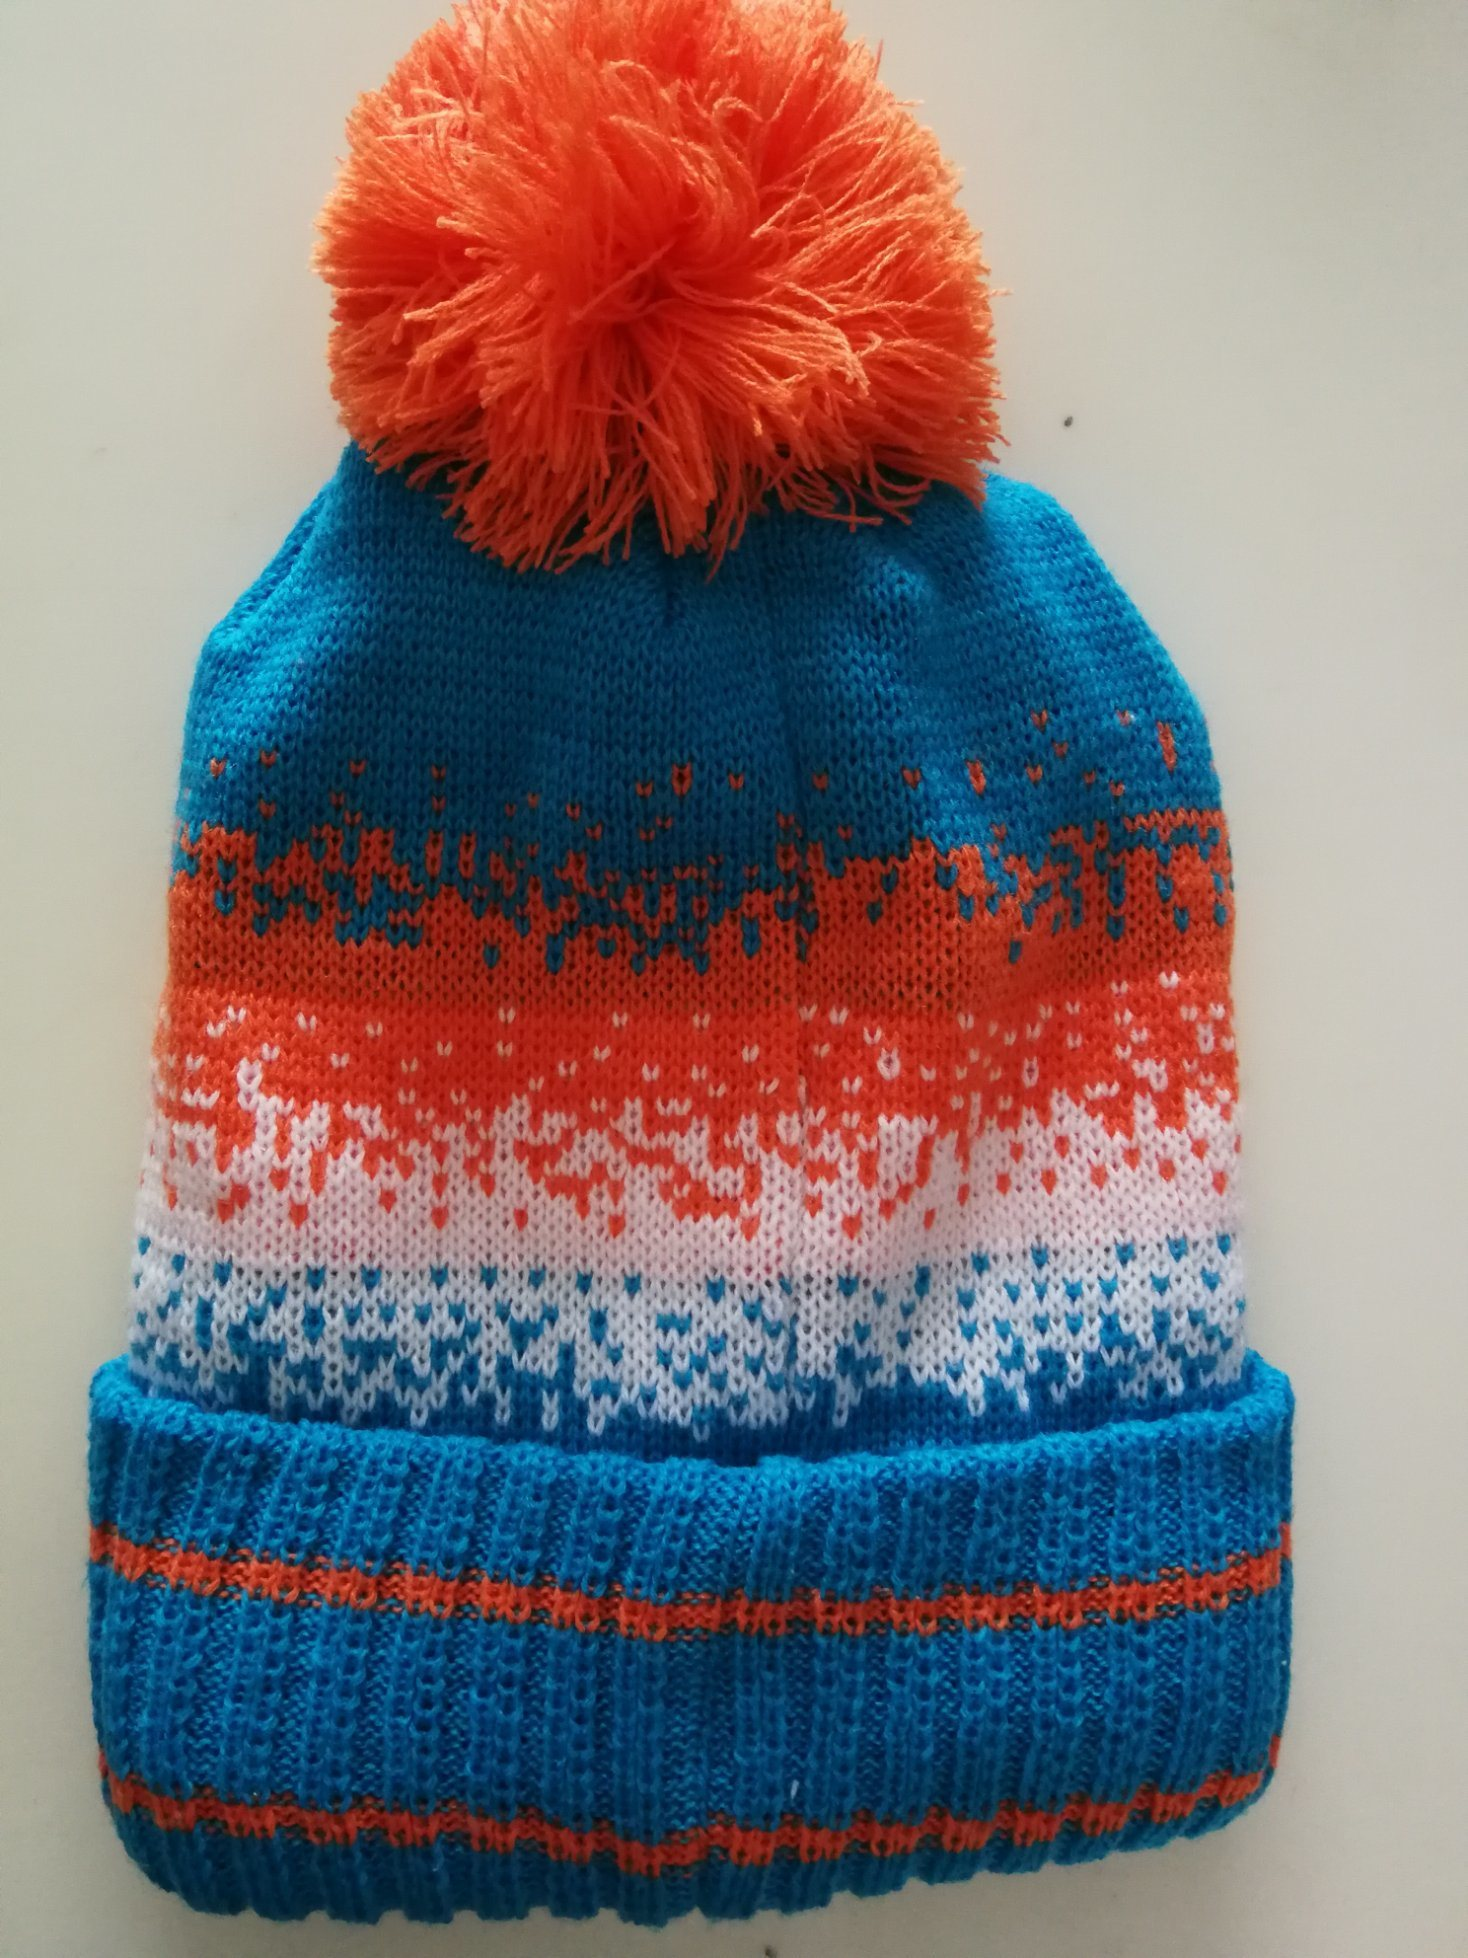 9f693b01 [Hot Item] Blue Beanie Hat Winter Warm Hats Knit Slouchy Skull Cap